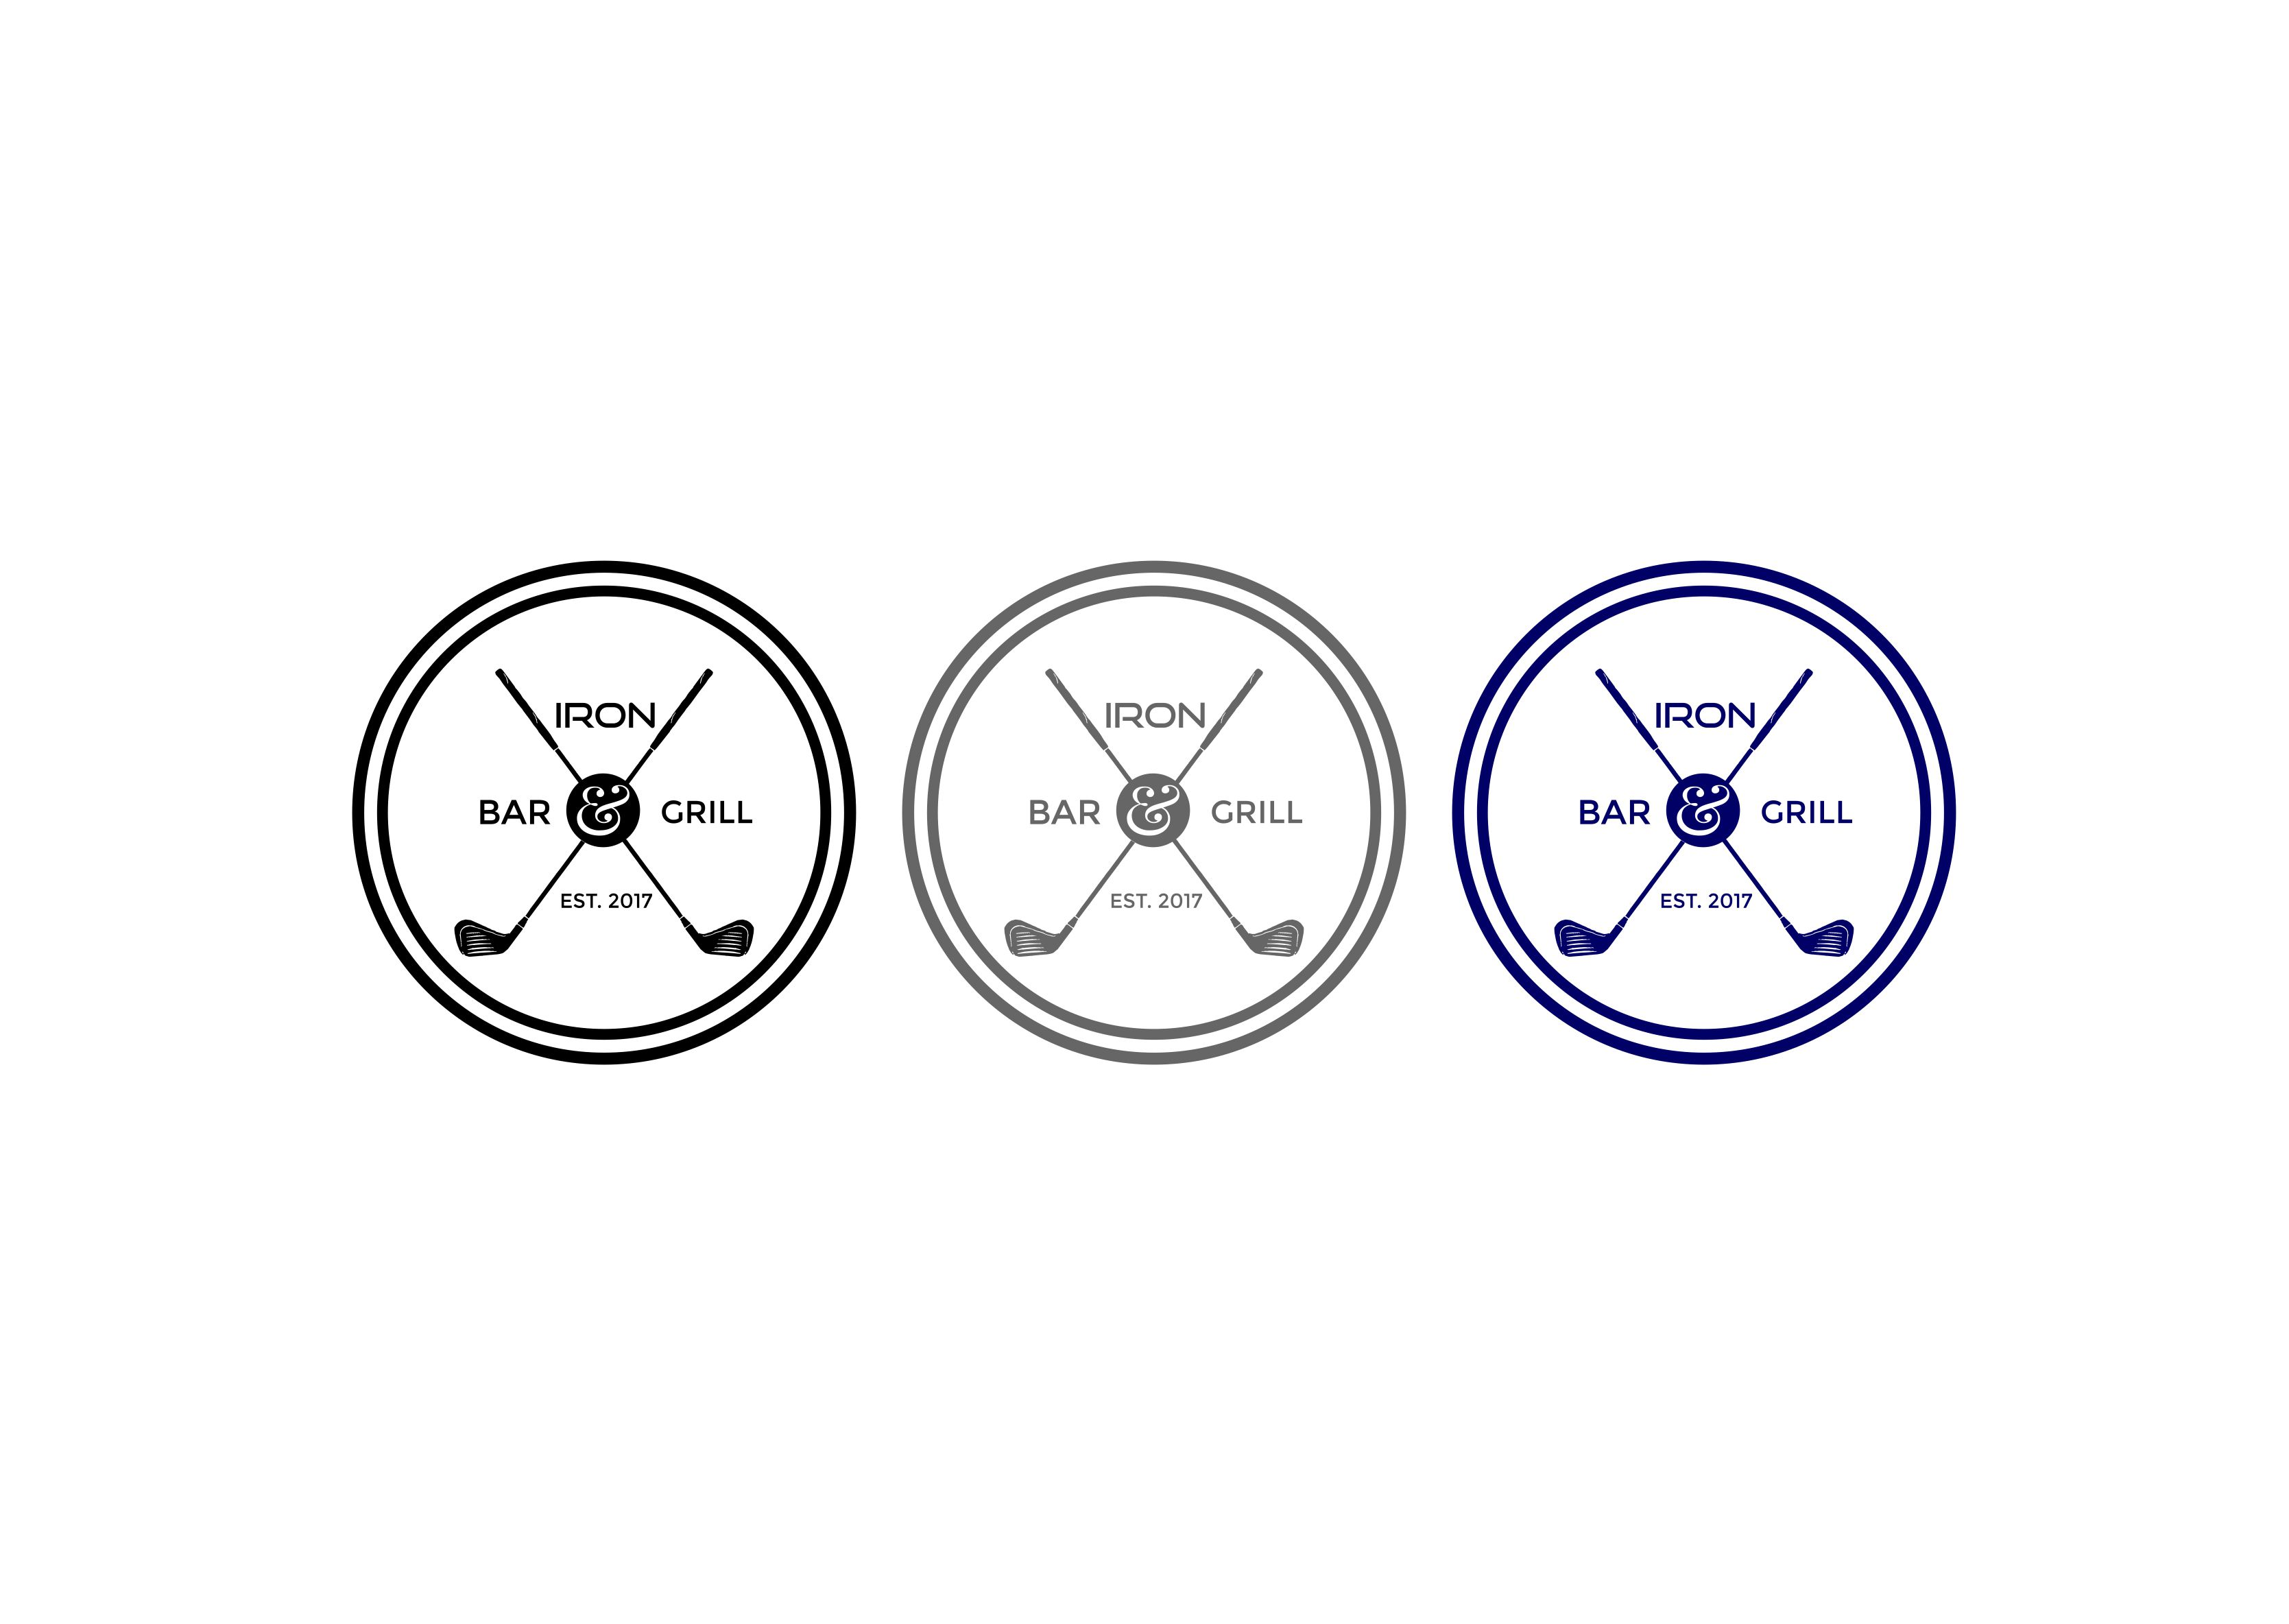 Logo Design by Gilang Satria - Entry No. 222 in the Logo Design Contest Captivating Logo Design for Brand'n Iron Bar & Grill.